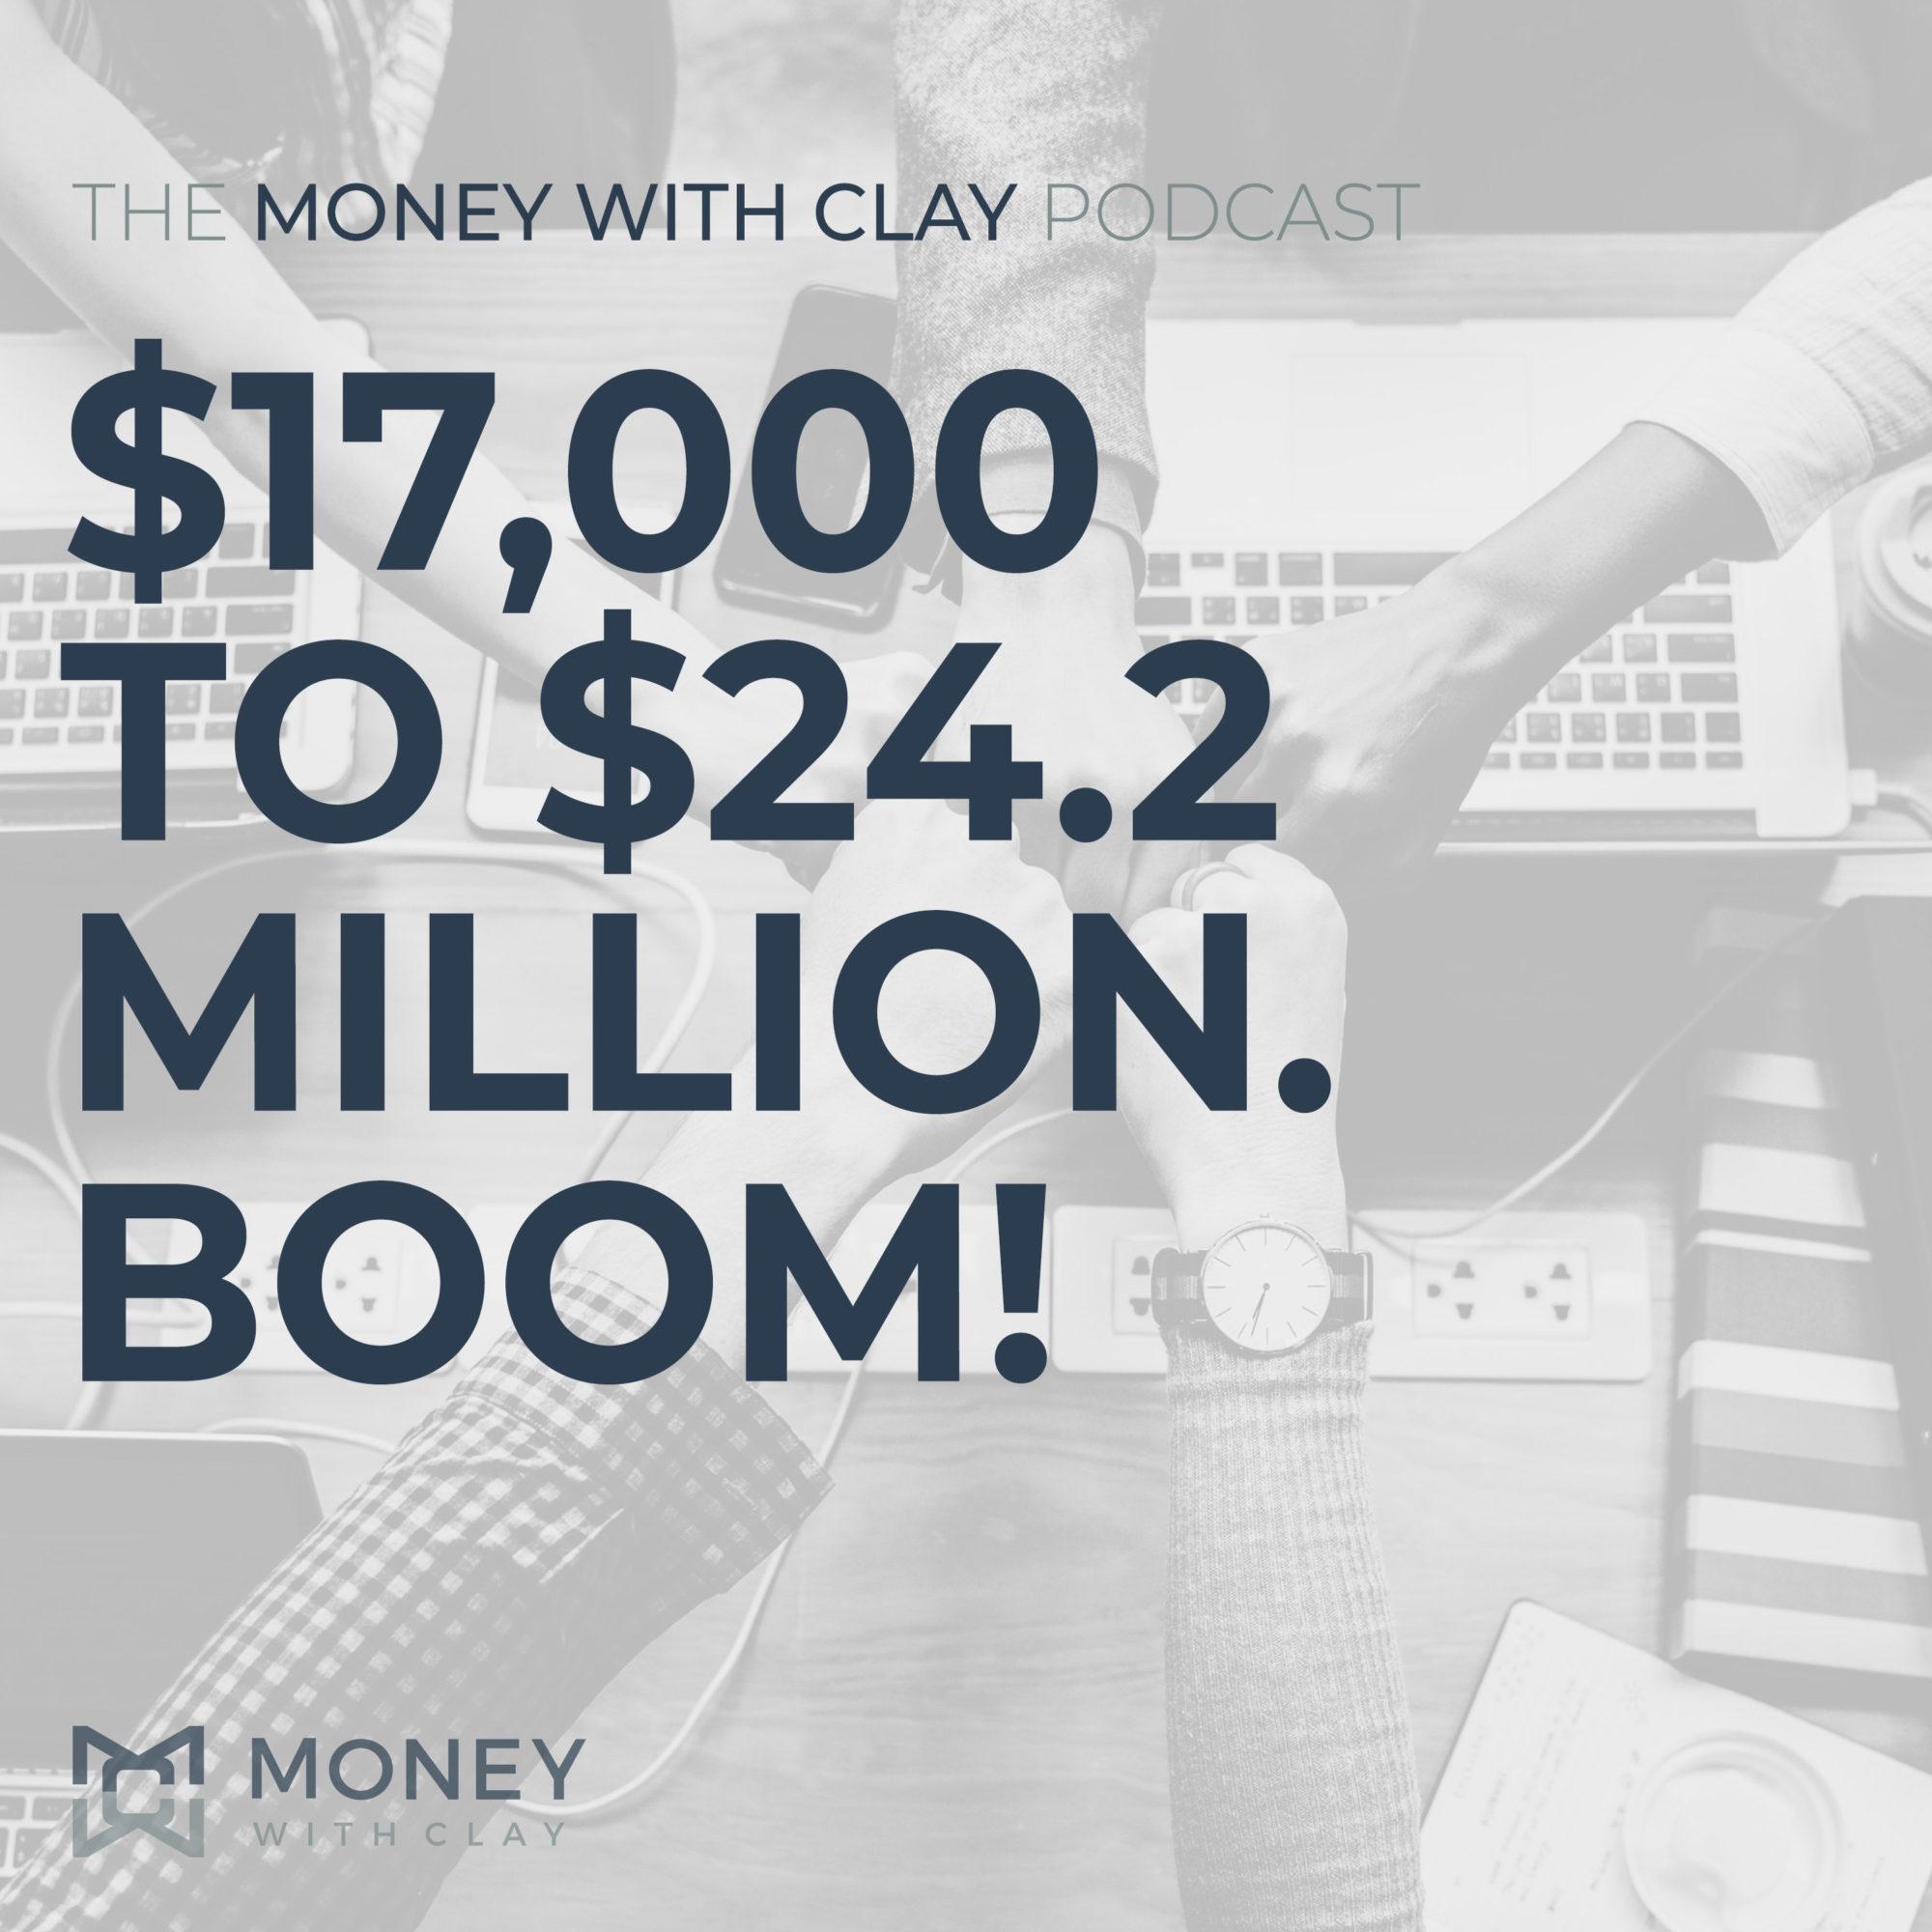 #052 - $17,000 to $24.2 Million. BOOM!